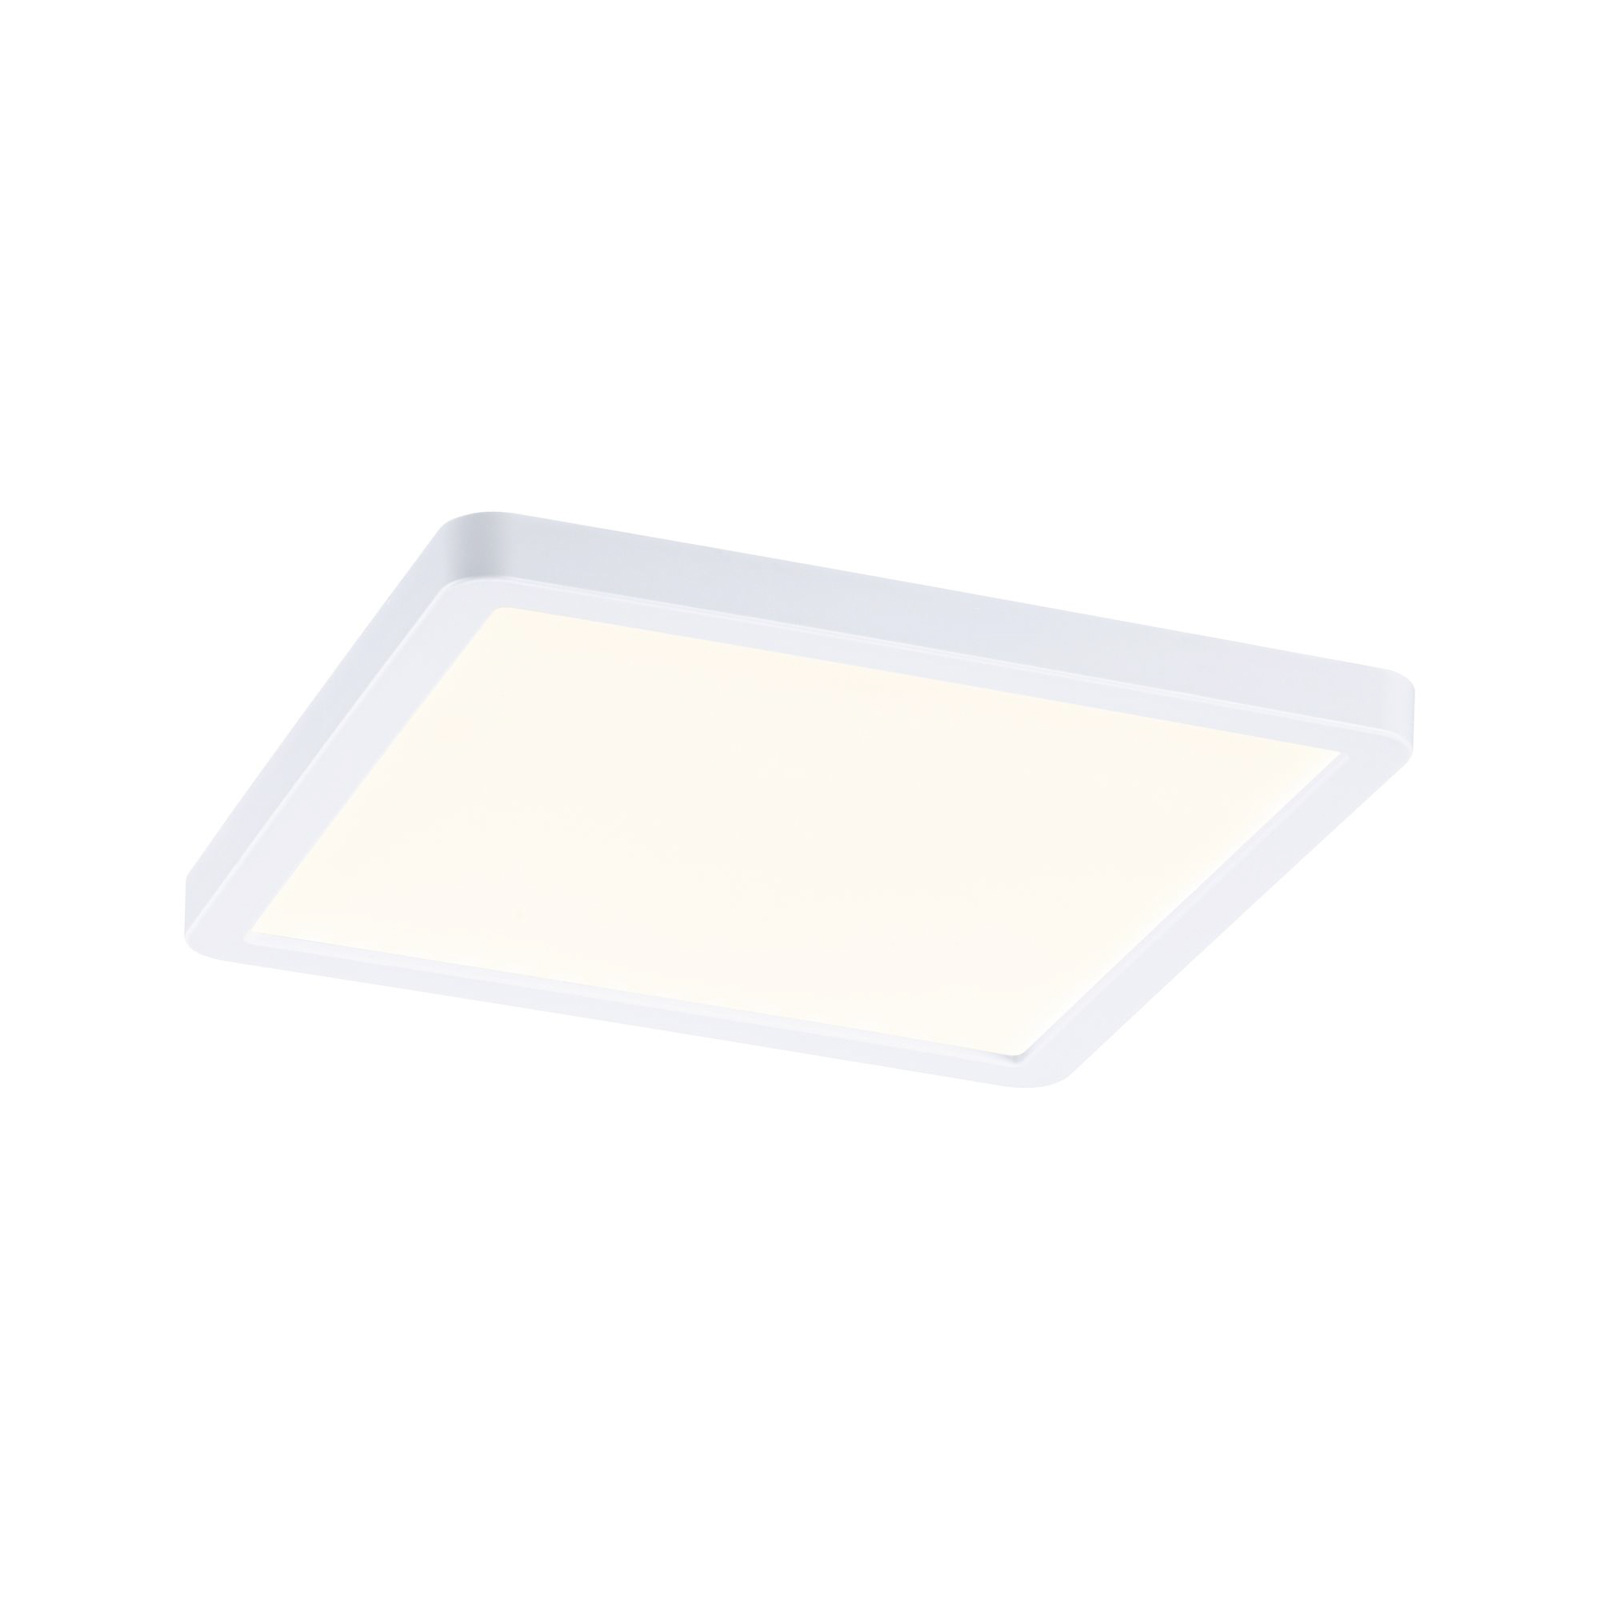 Paulmann LED-Panel Areo ZigBee eckig weiß 17,5cm